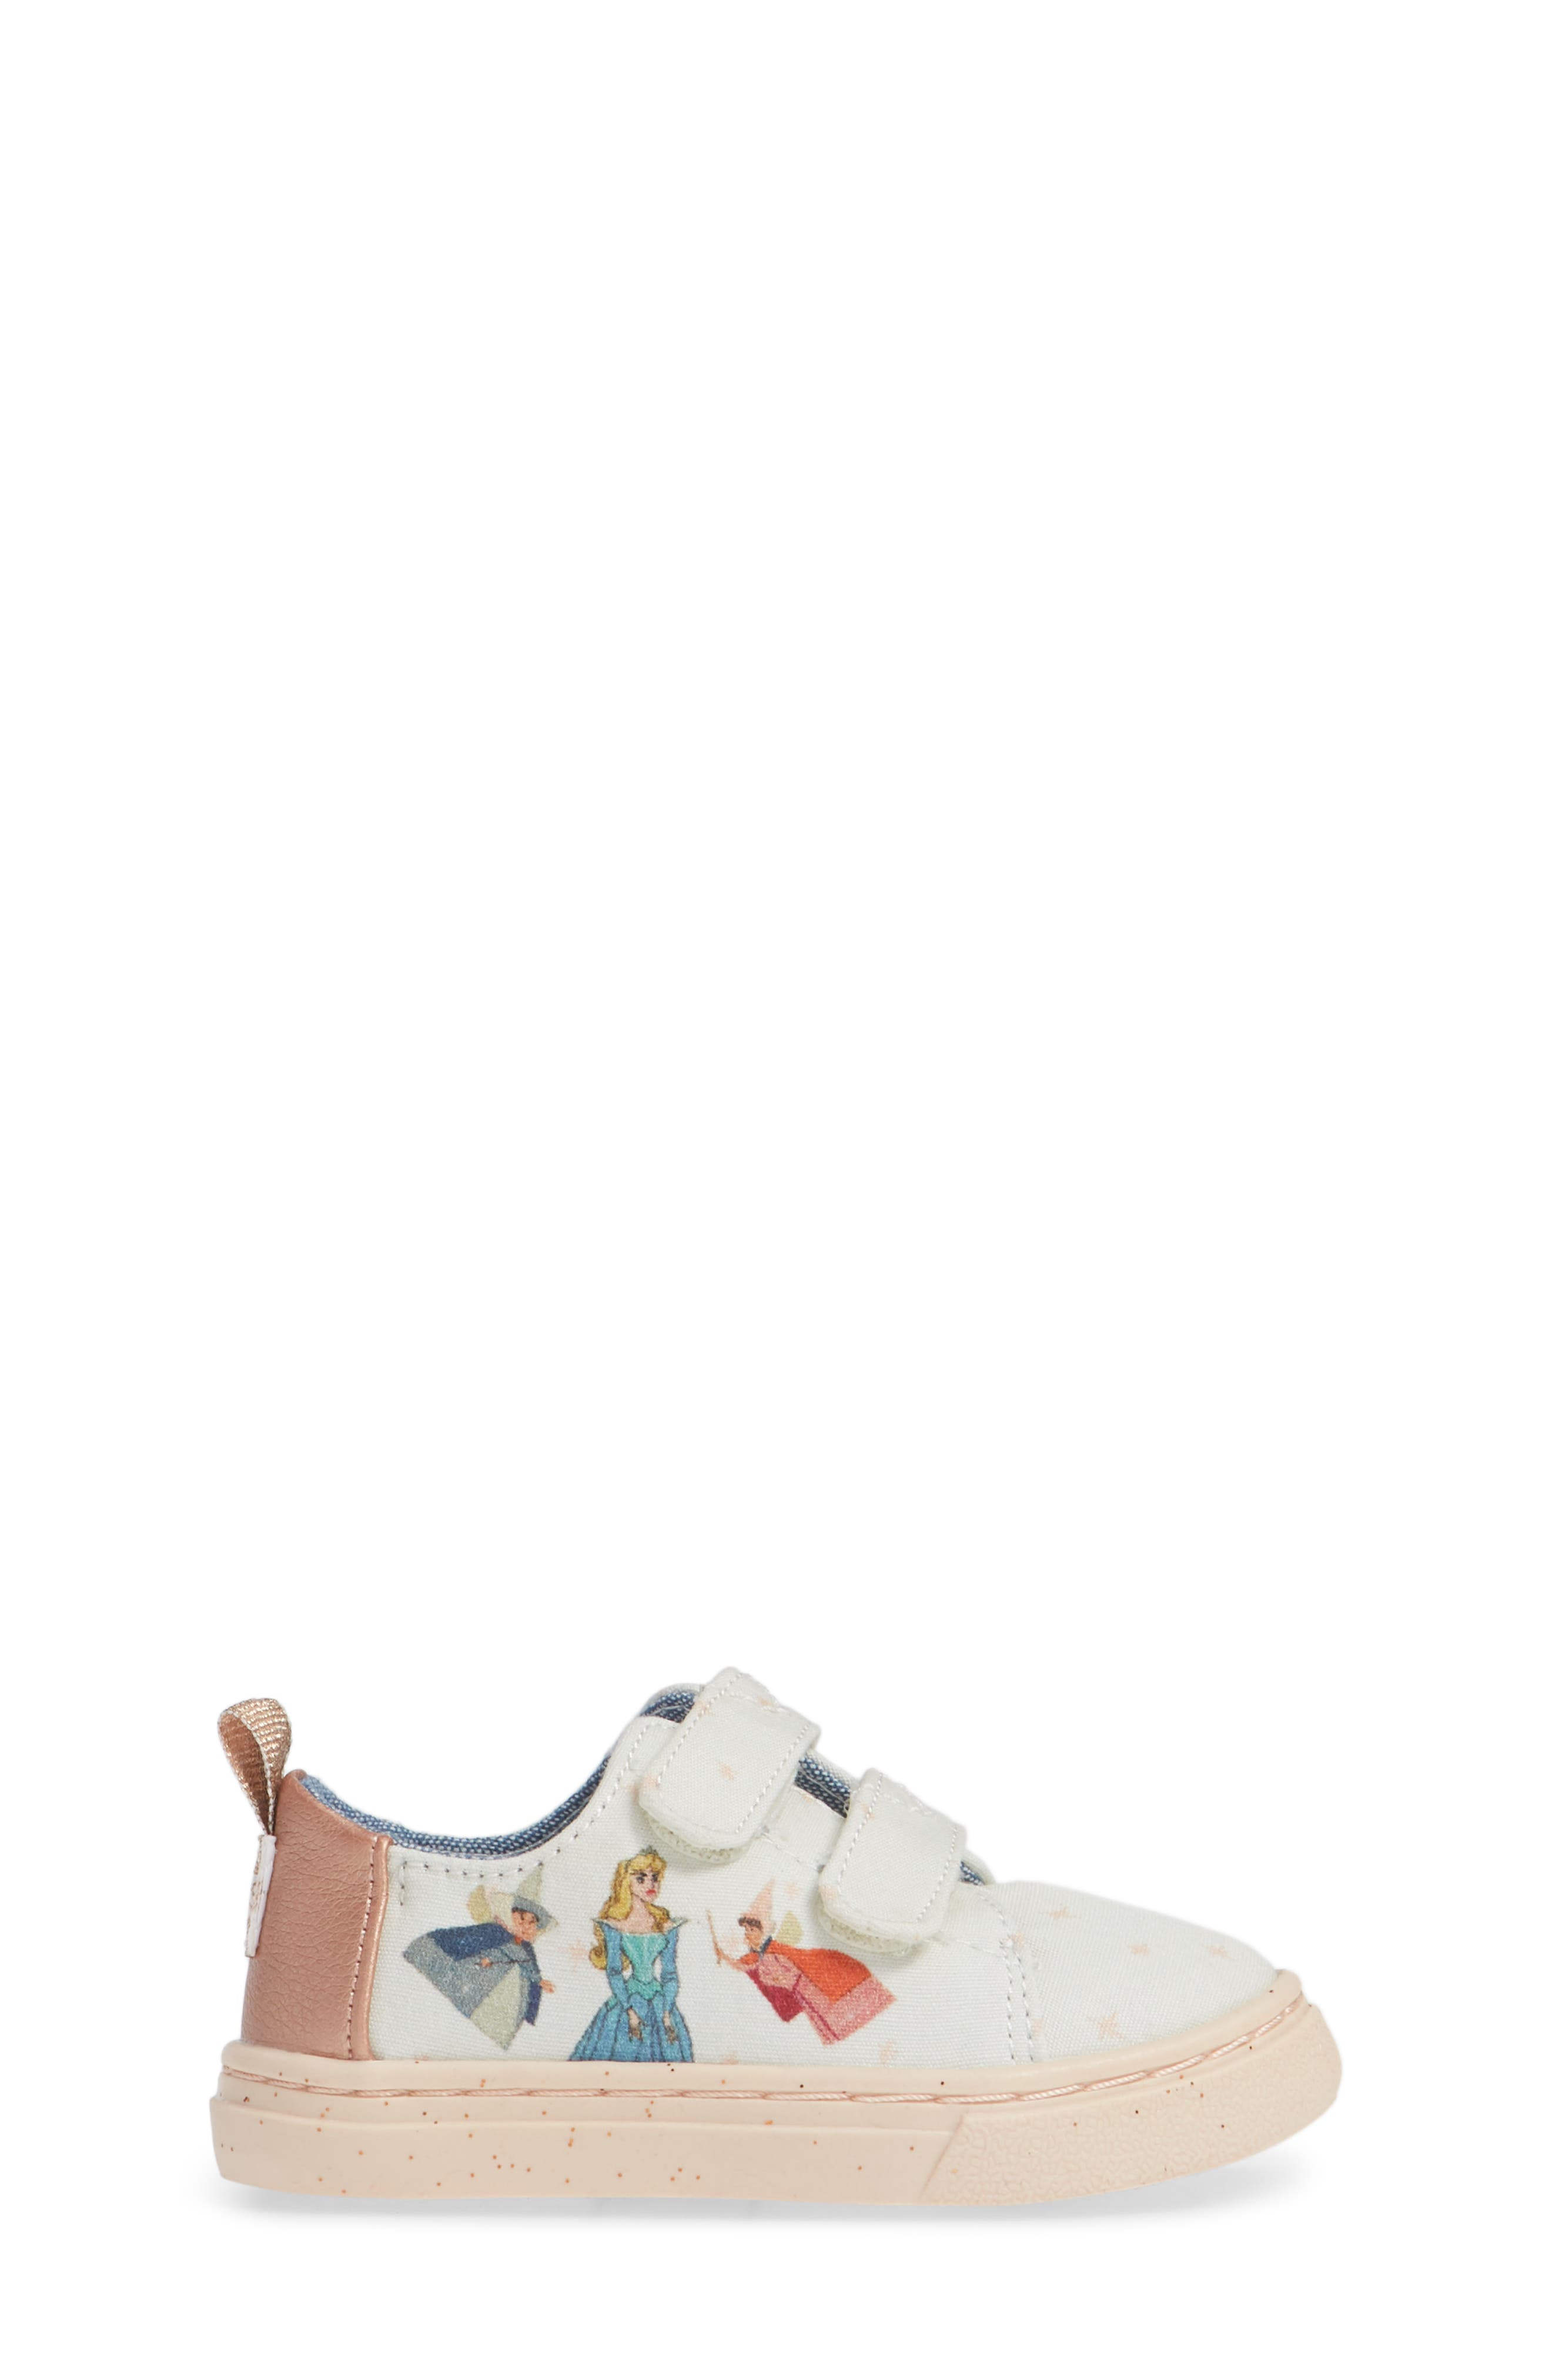 x Disney Tiny Lenny Sneaker,                             Alternate thumbnail 3, color,                             900